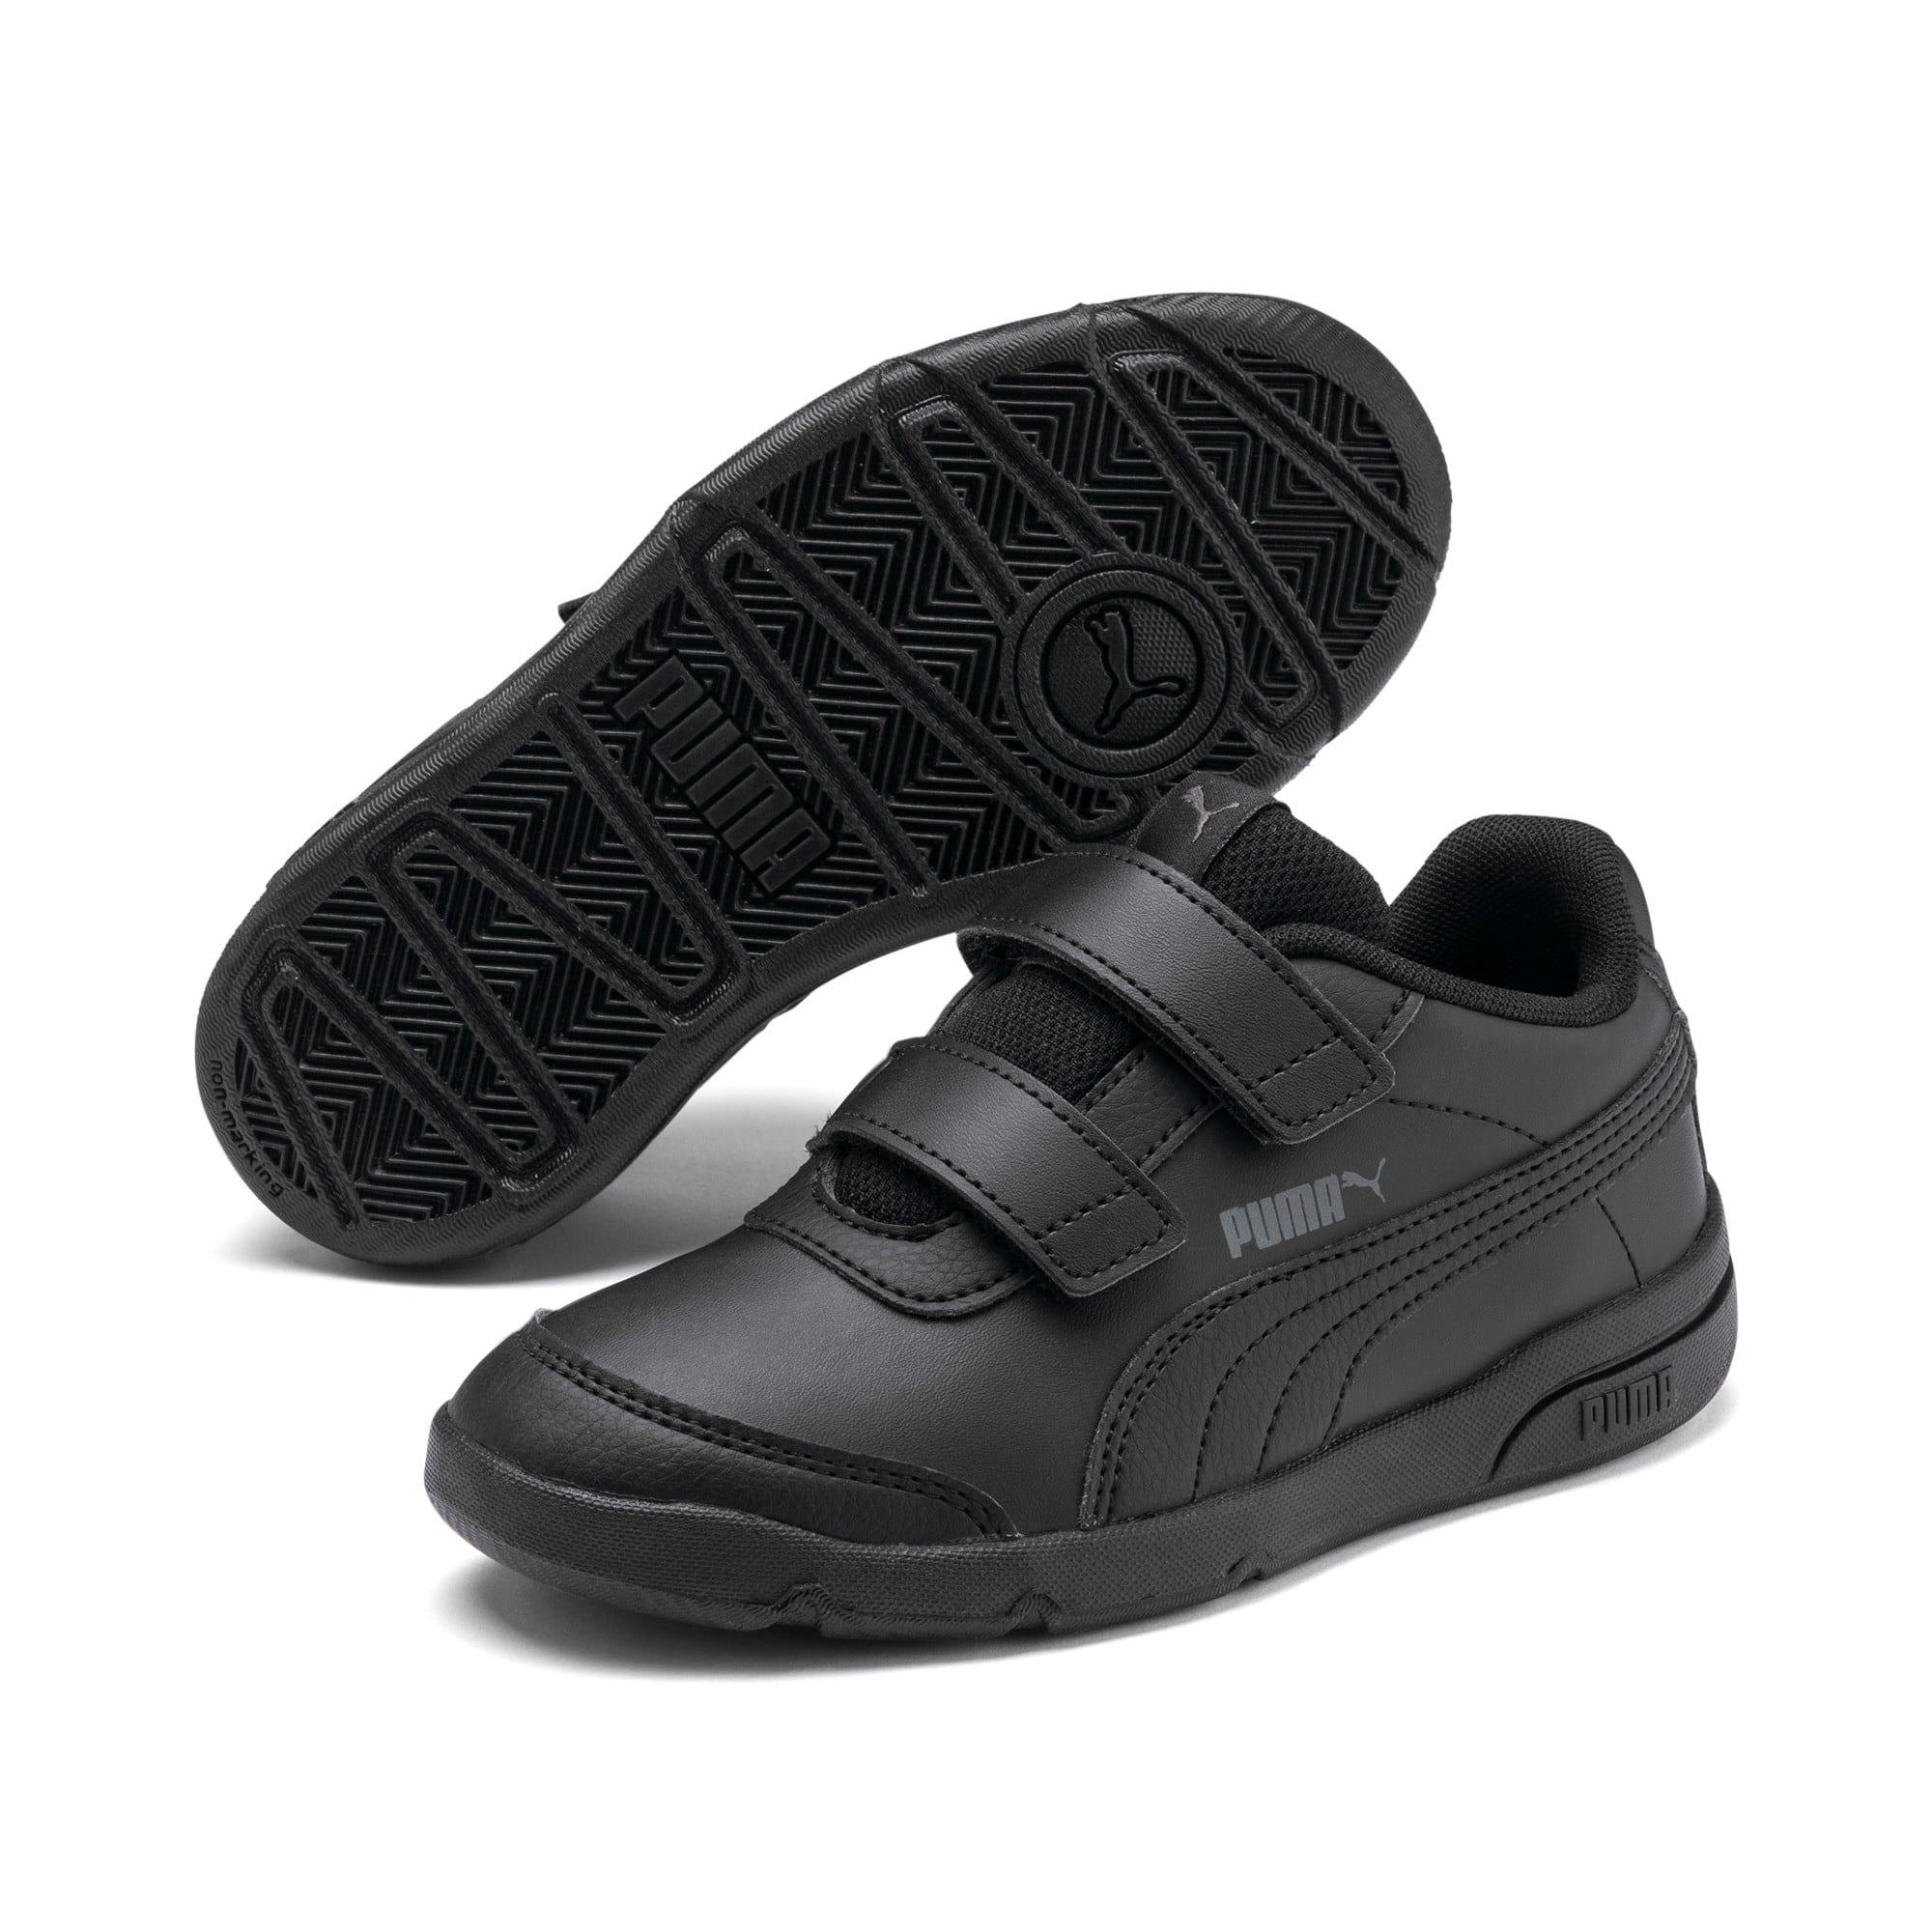 Thumbnail 2 of Stepfleex 2 SL VE V Kids Sneaker, Puma Black-Puma Black, medium